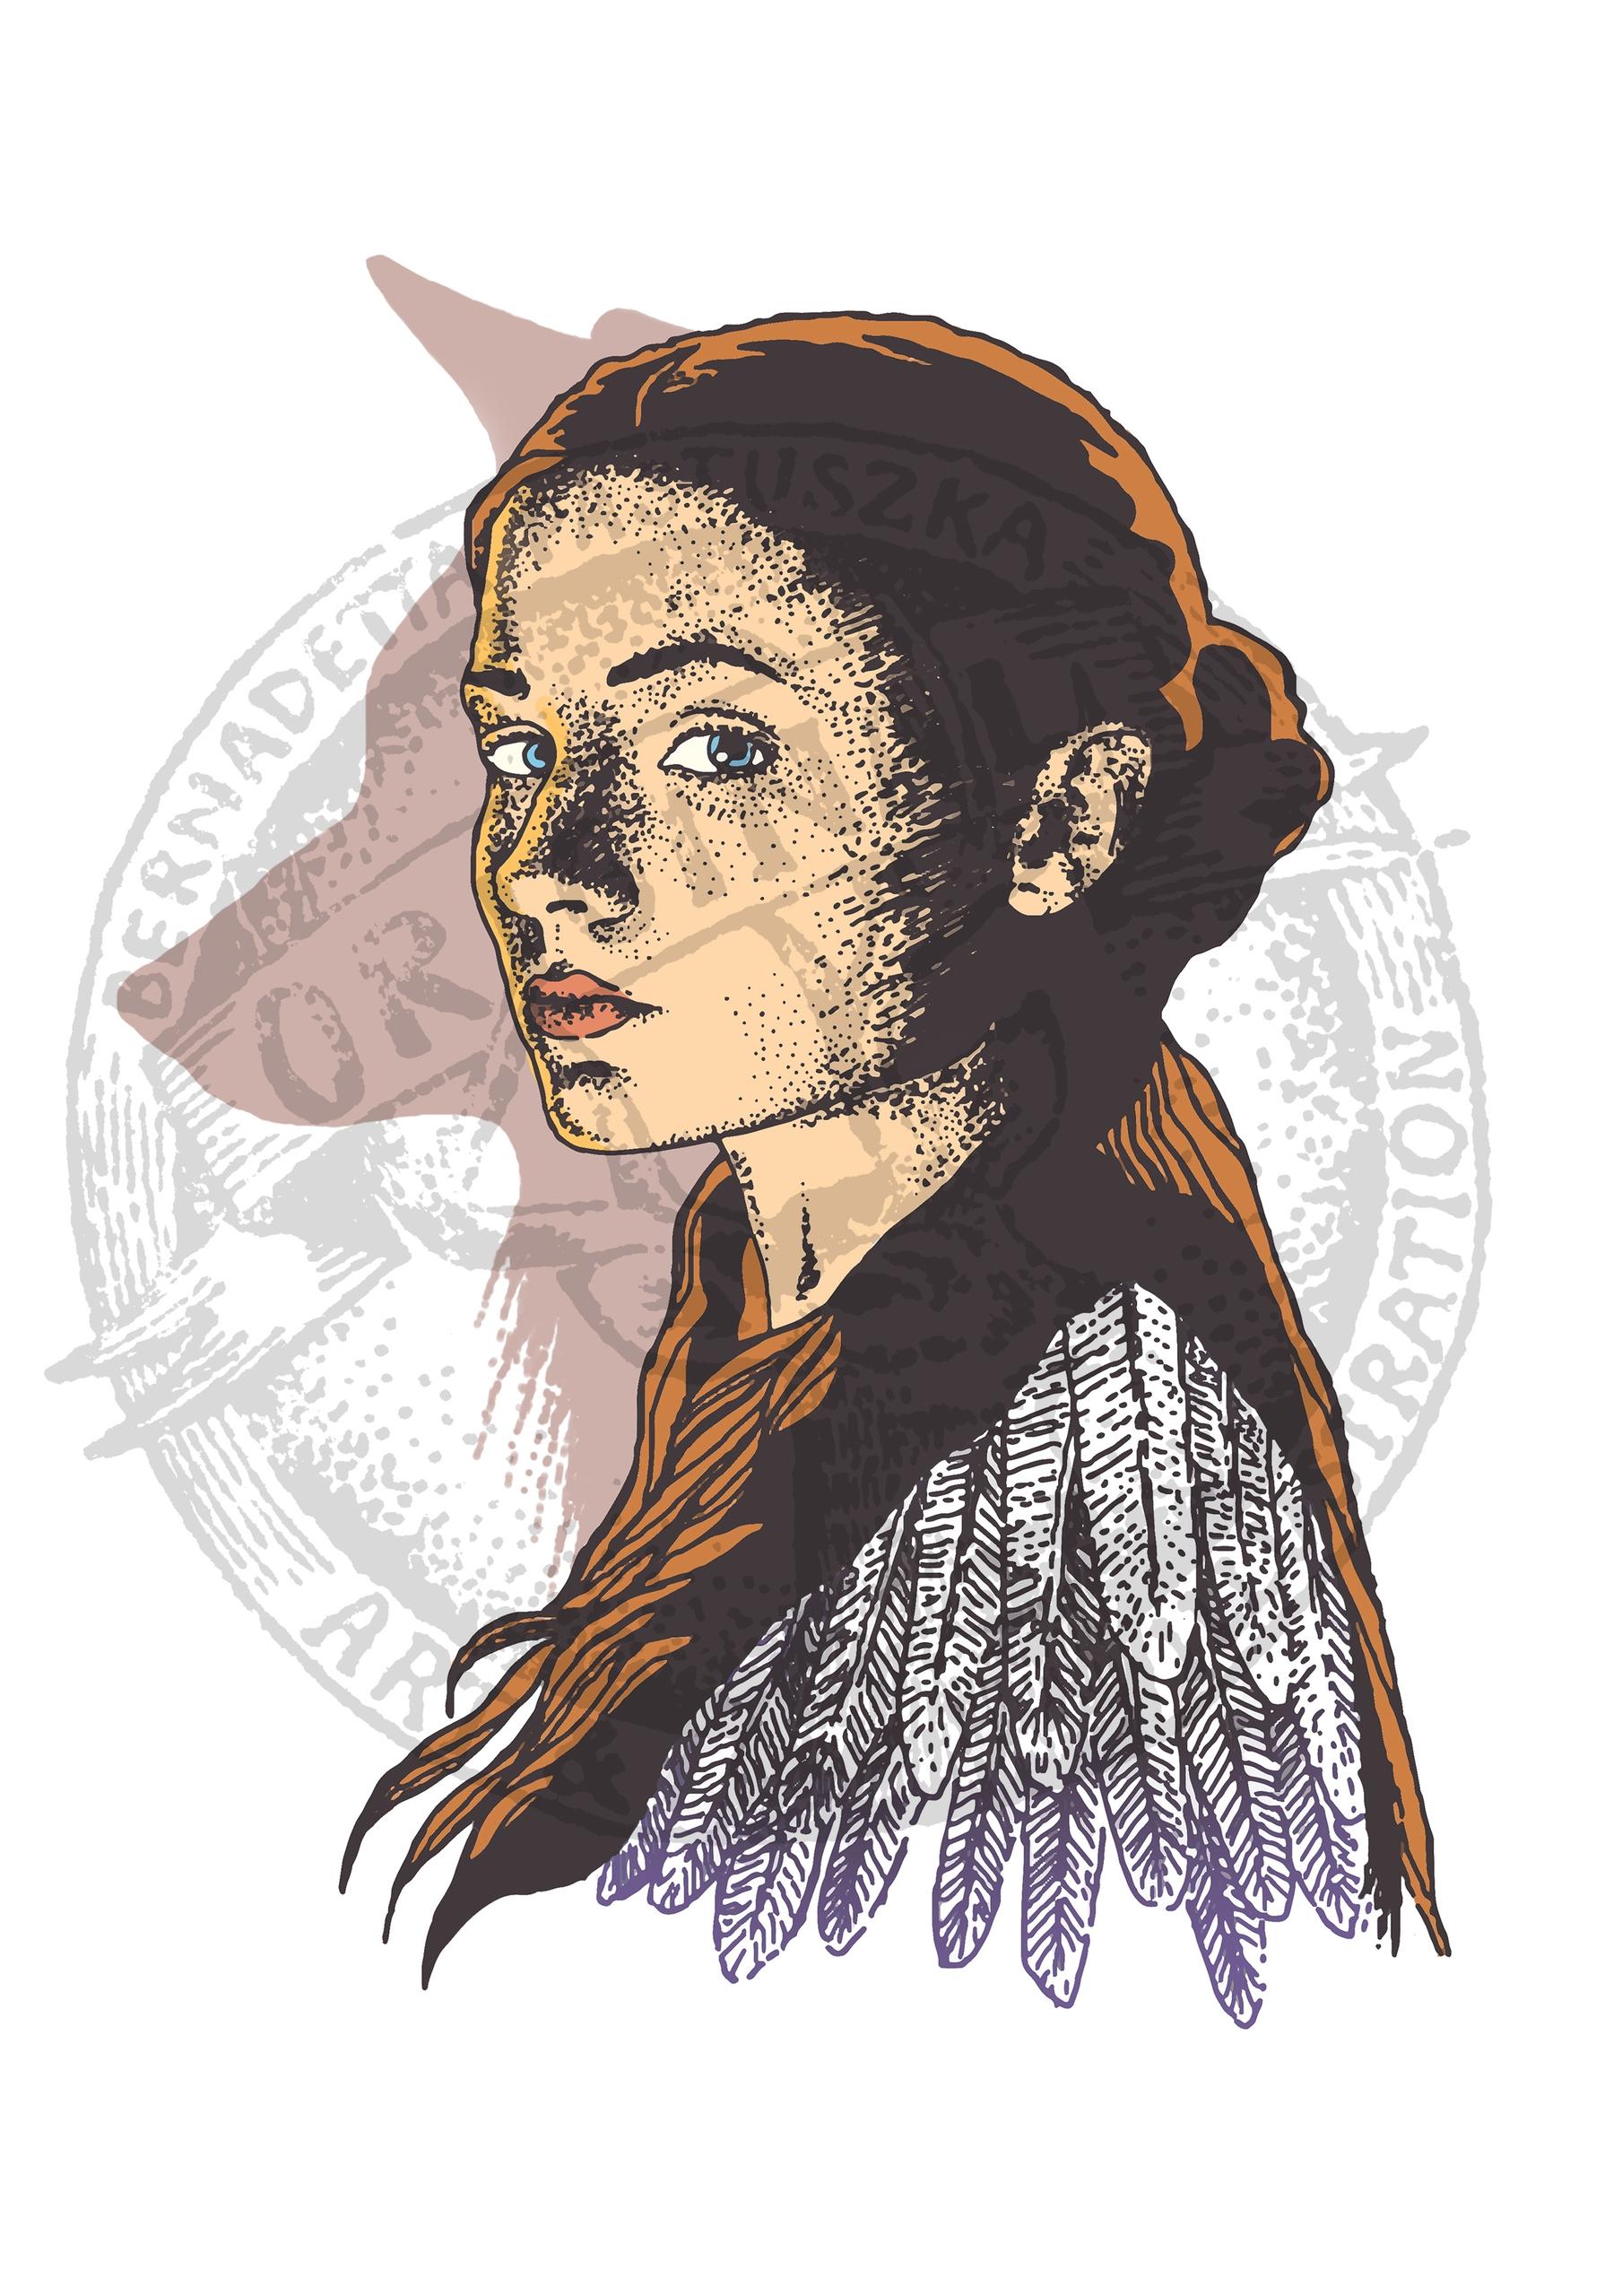 Sansa Stark Alayne Stone fanart - betka_past | ello